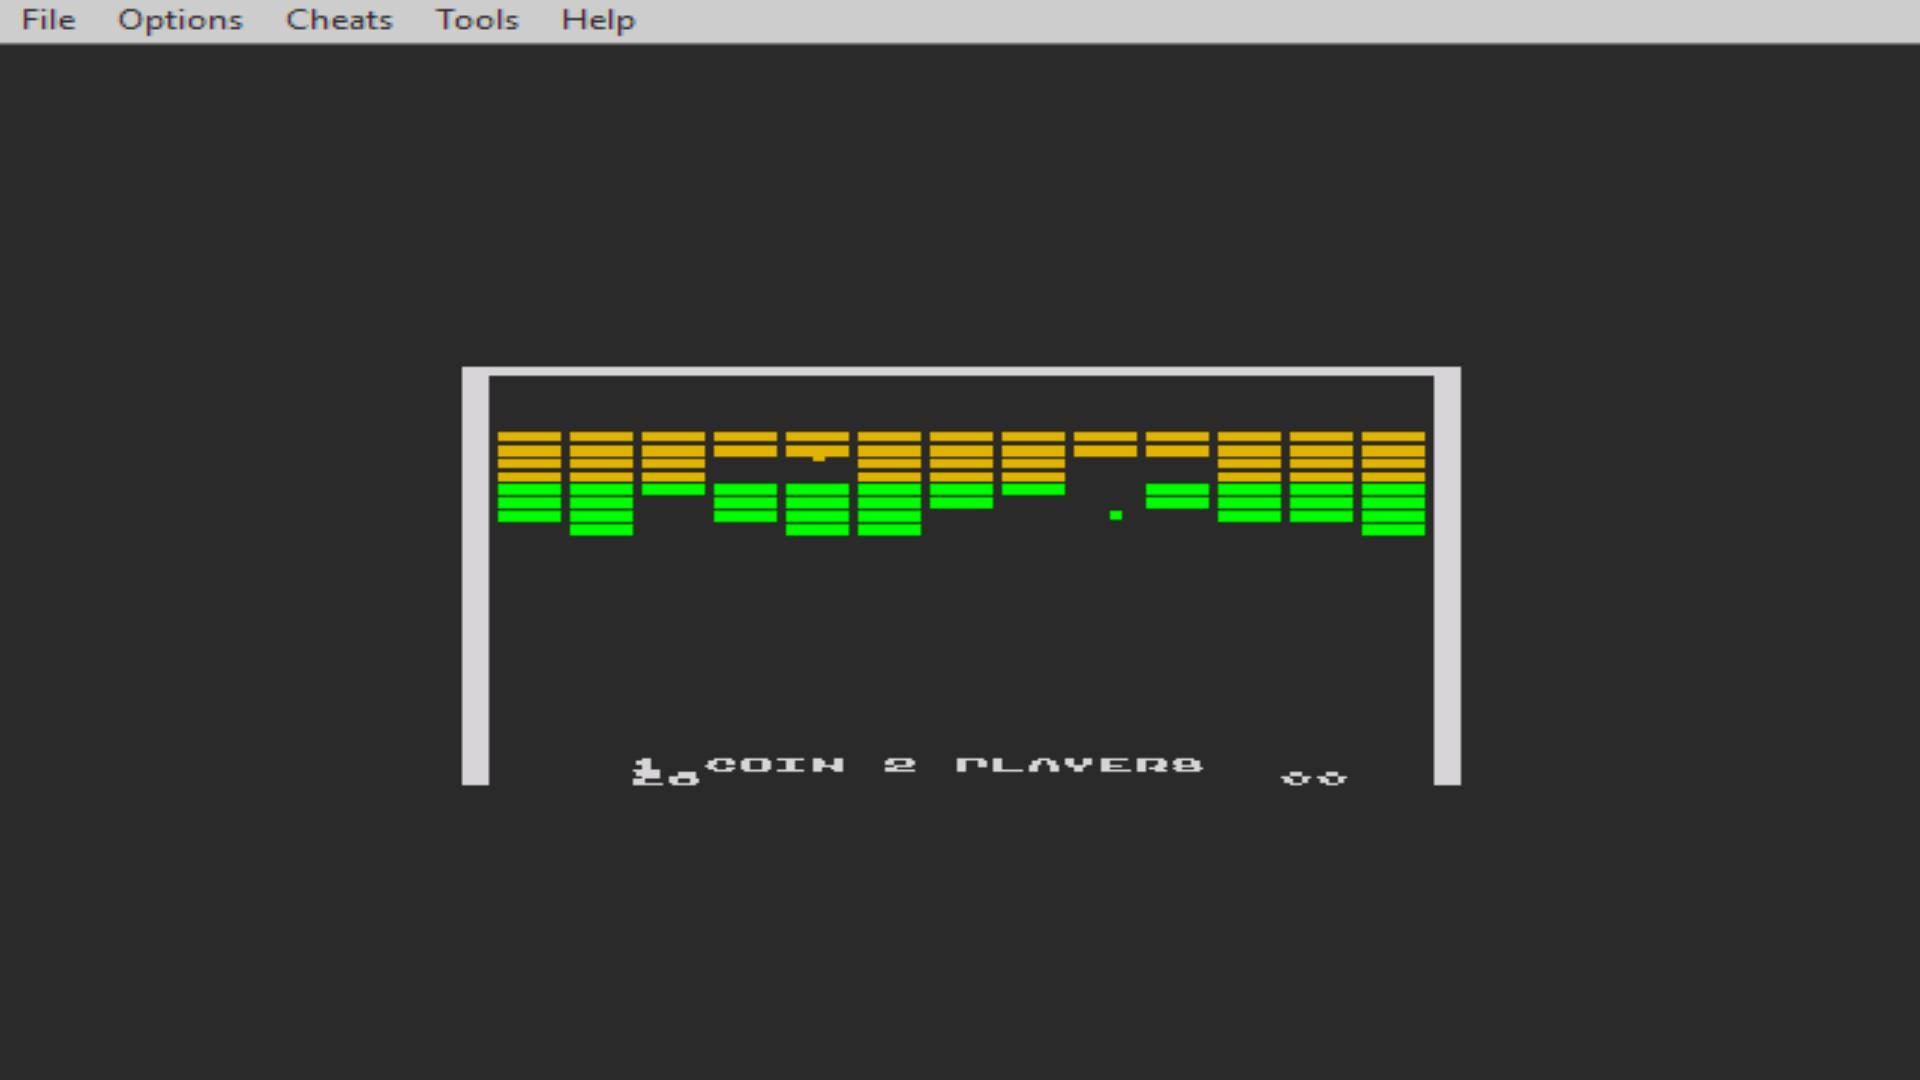 AkinNahtanoj: Atari Anniversary Advance: Super Breakout (GBA Emulated) 26 points on 2020-10-16 16:00:05